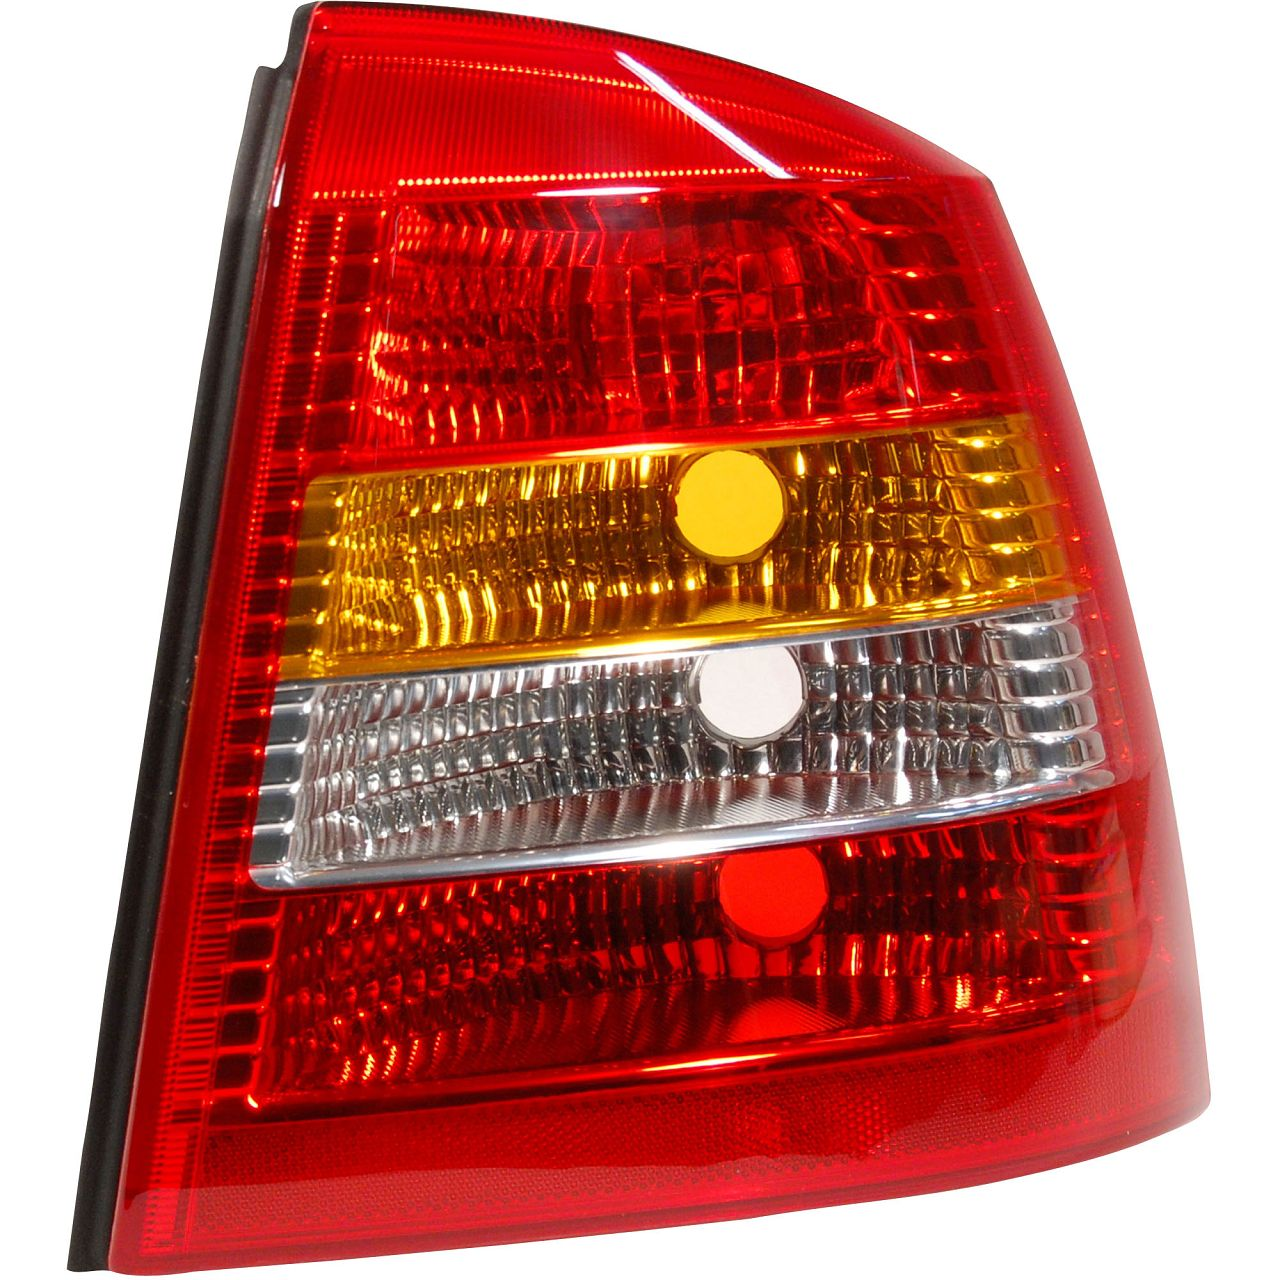 MAGNETI MARELLI Heckleuchte Rückleuchte Gelb Rot OPEL Astra G CC rechts 9117404